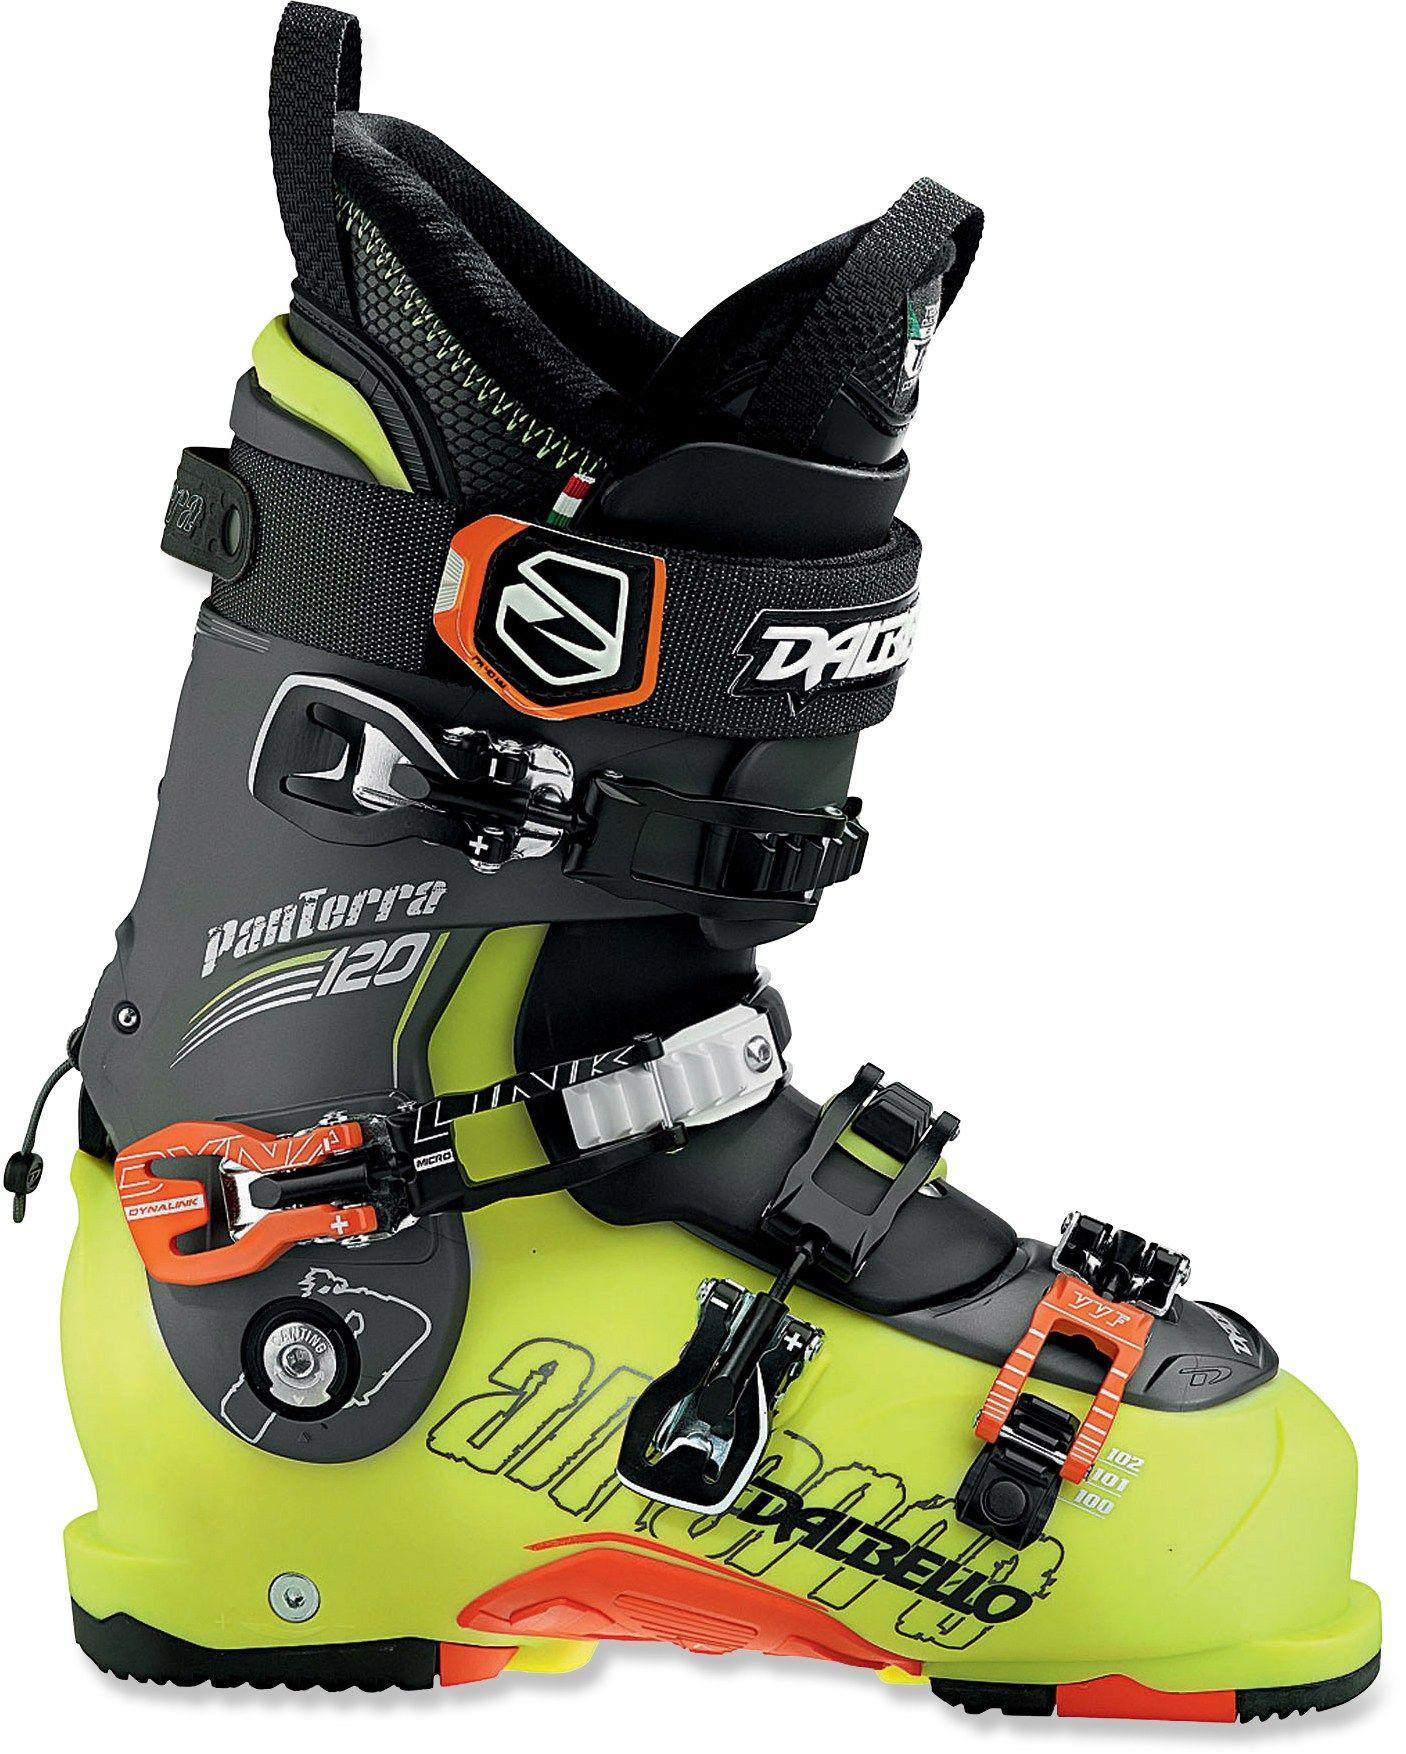 Dalbello Panterra 120 Ski Boots Men S 2014 2015 Rei Co Op Ski Boots Design Ski Boots Boots